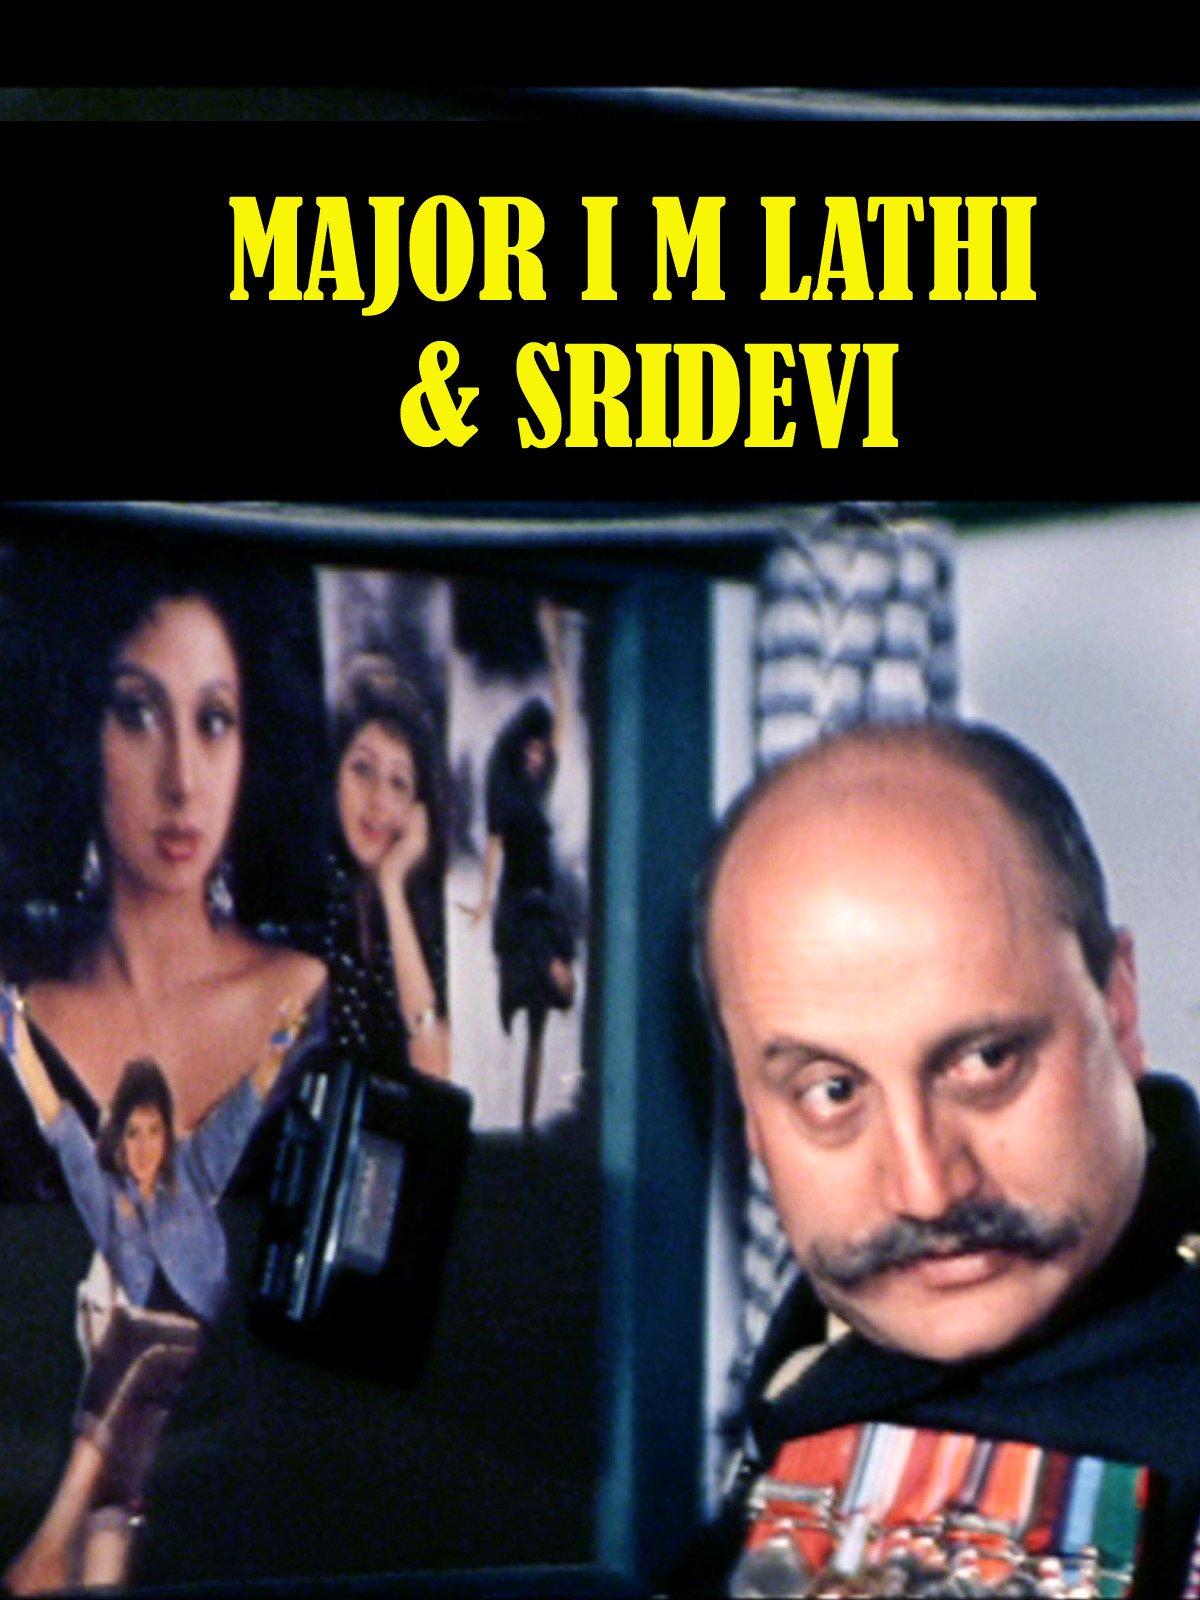 Clip: Major I M Lathi & Sridevi